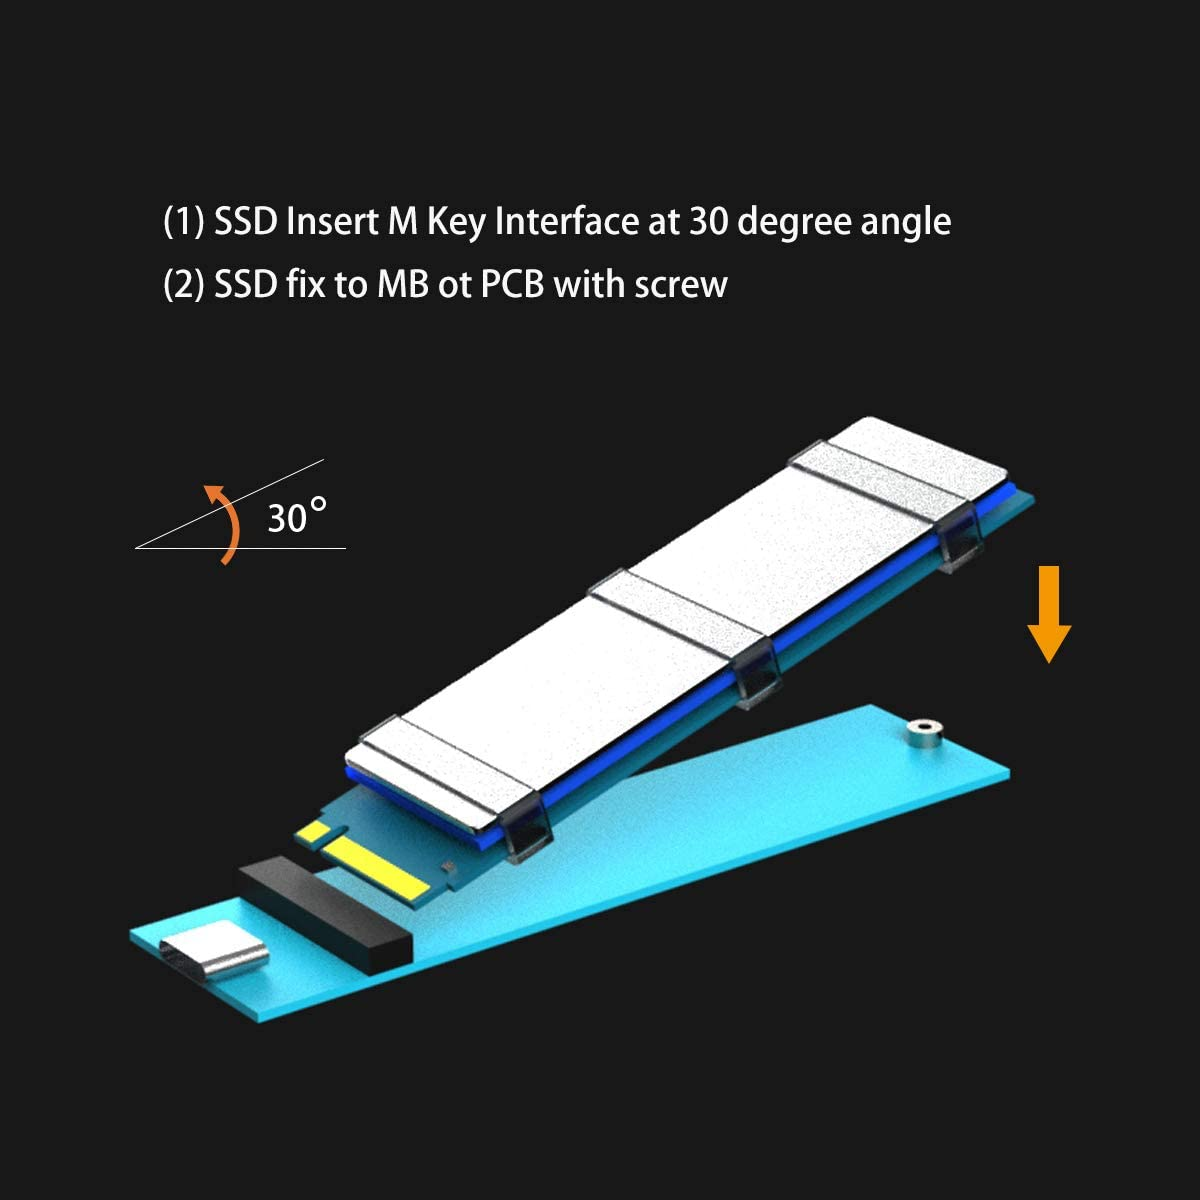 M.2 Screw Kit and Laptop M.2 Heatsink for ASUS//MSI//Gigabyte etc MB